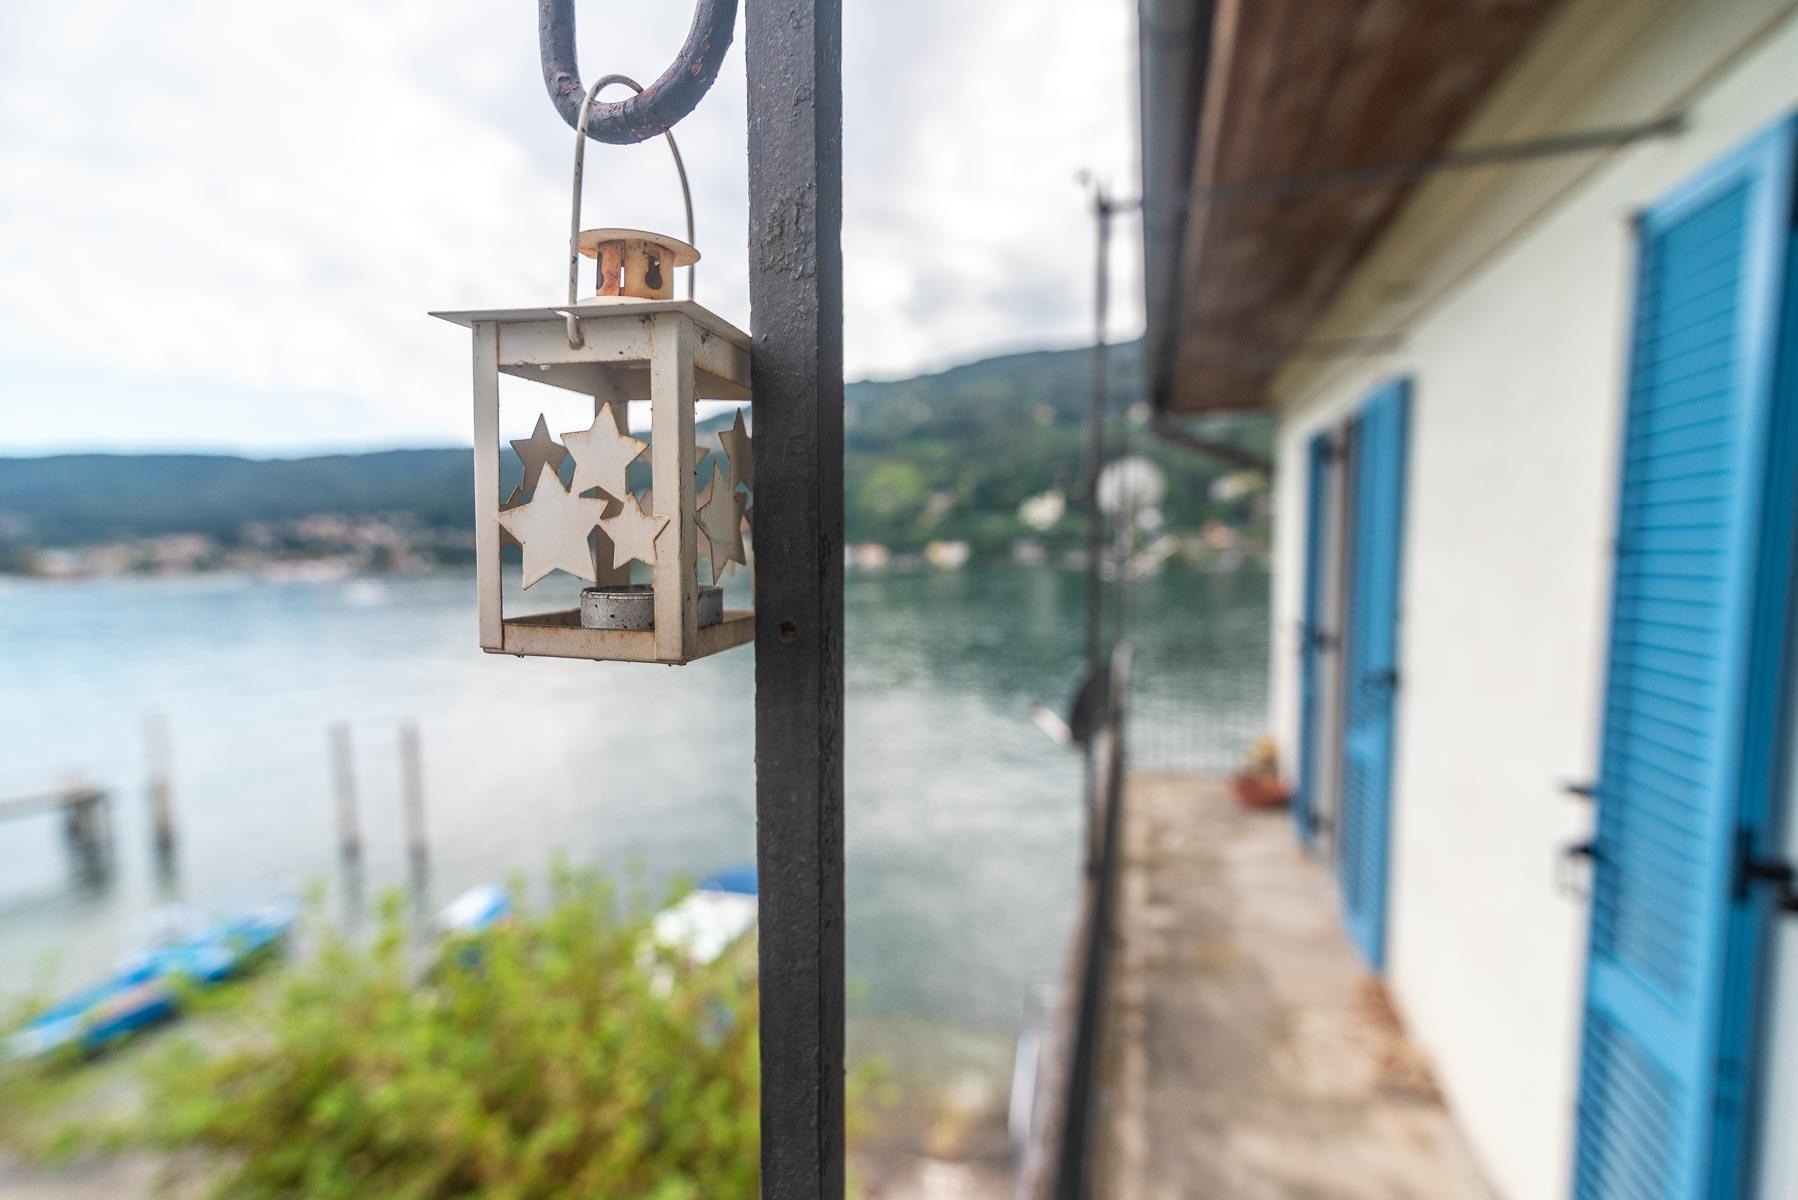 Apartment for sale in Pescatori Island, Stresa - detail